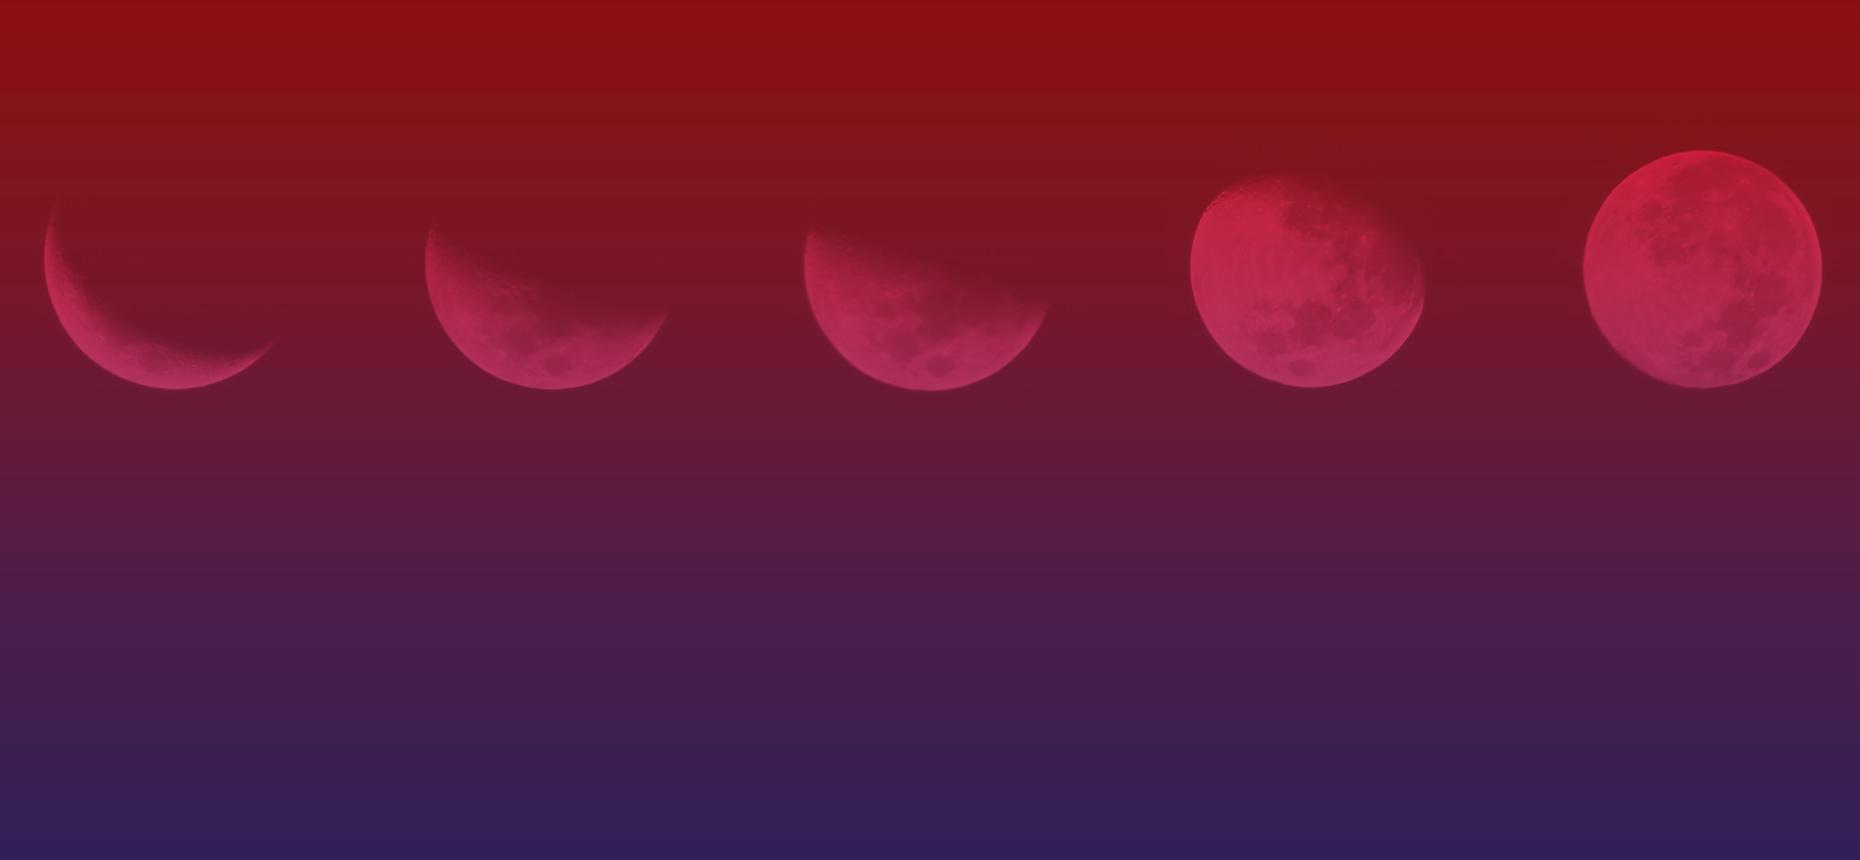 Tenda da Lua